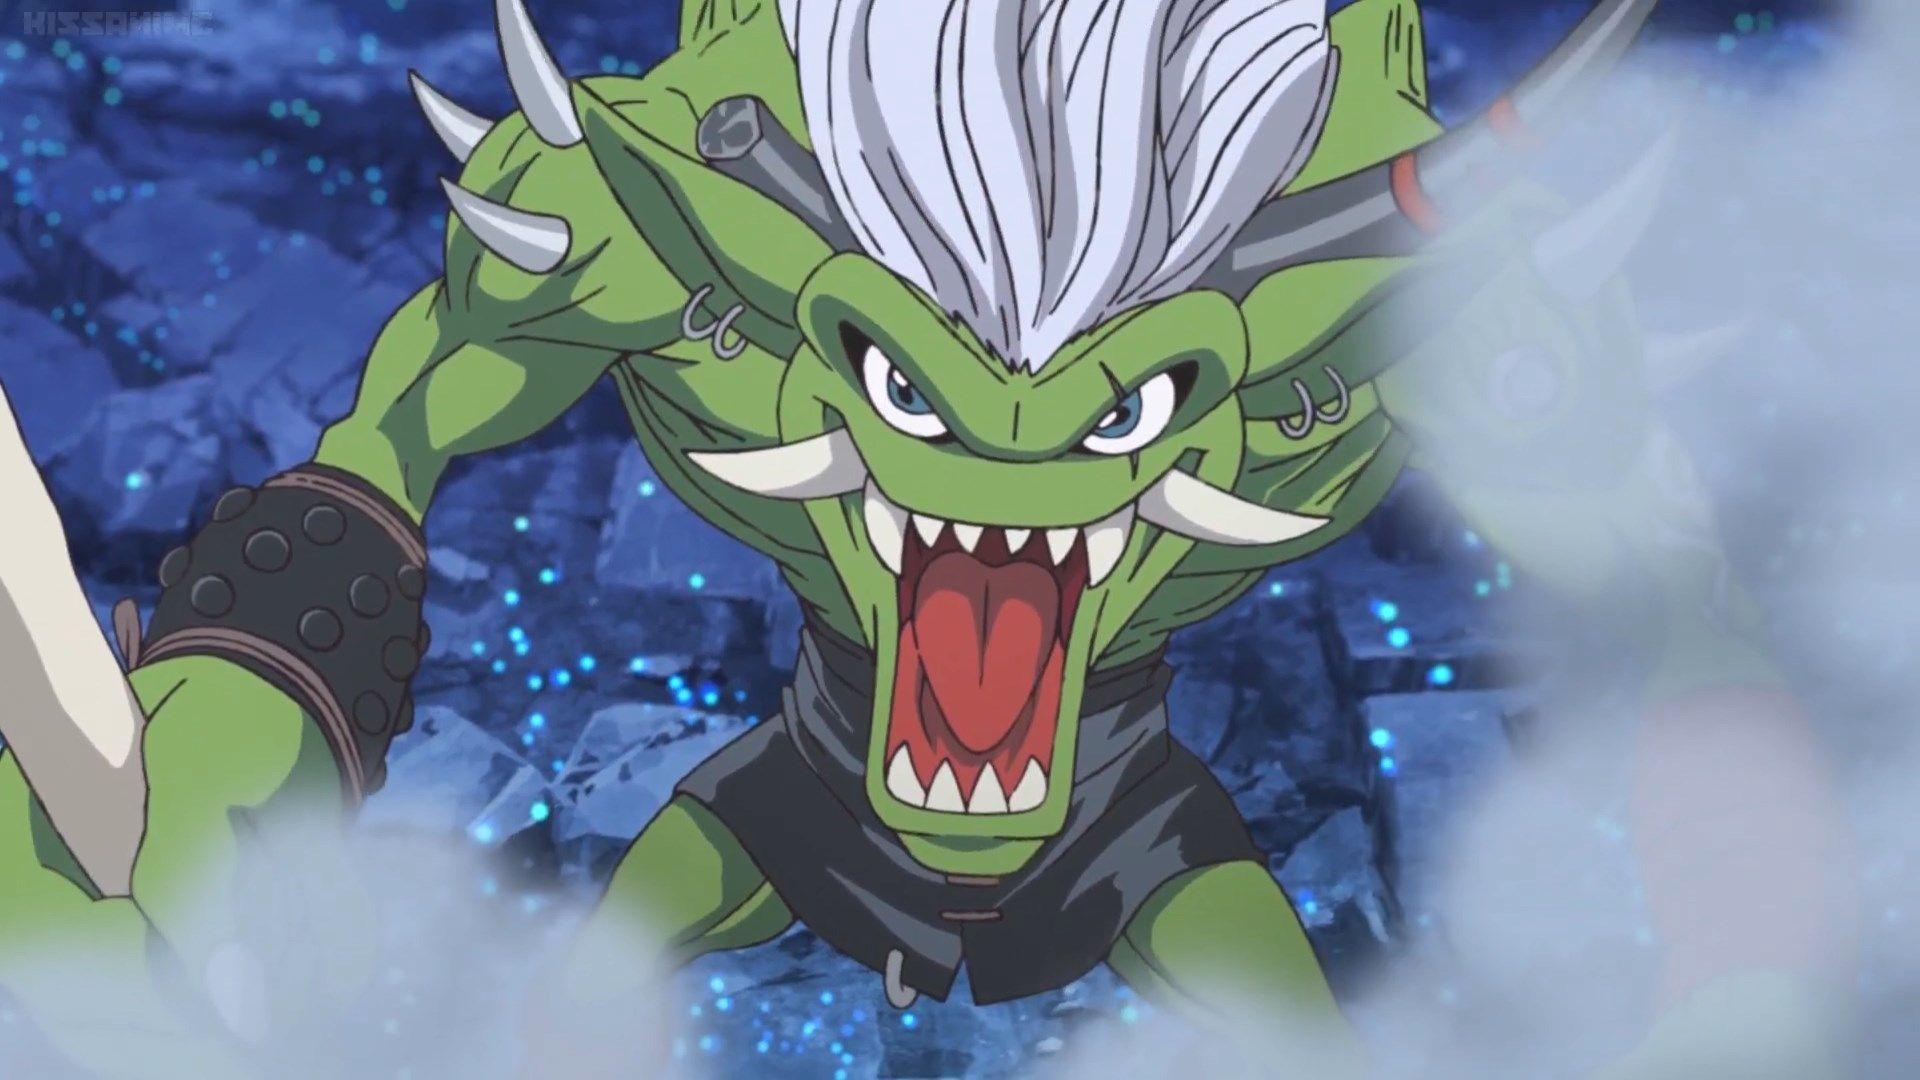 Digimonadventure2020 E9 Ogremon 2 In 2020 Animated Movies Digimon Adventure Digimon